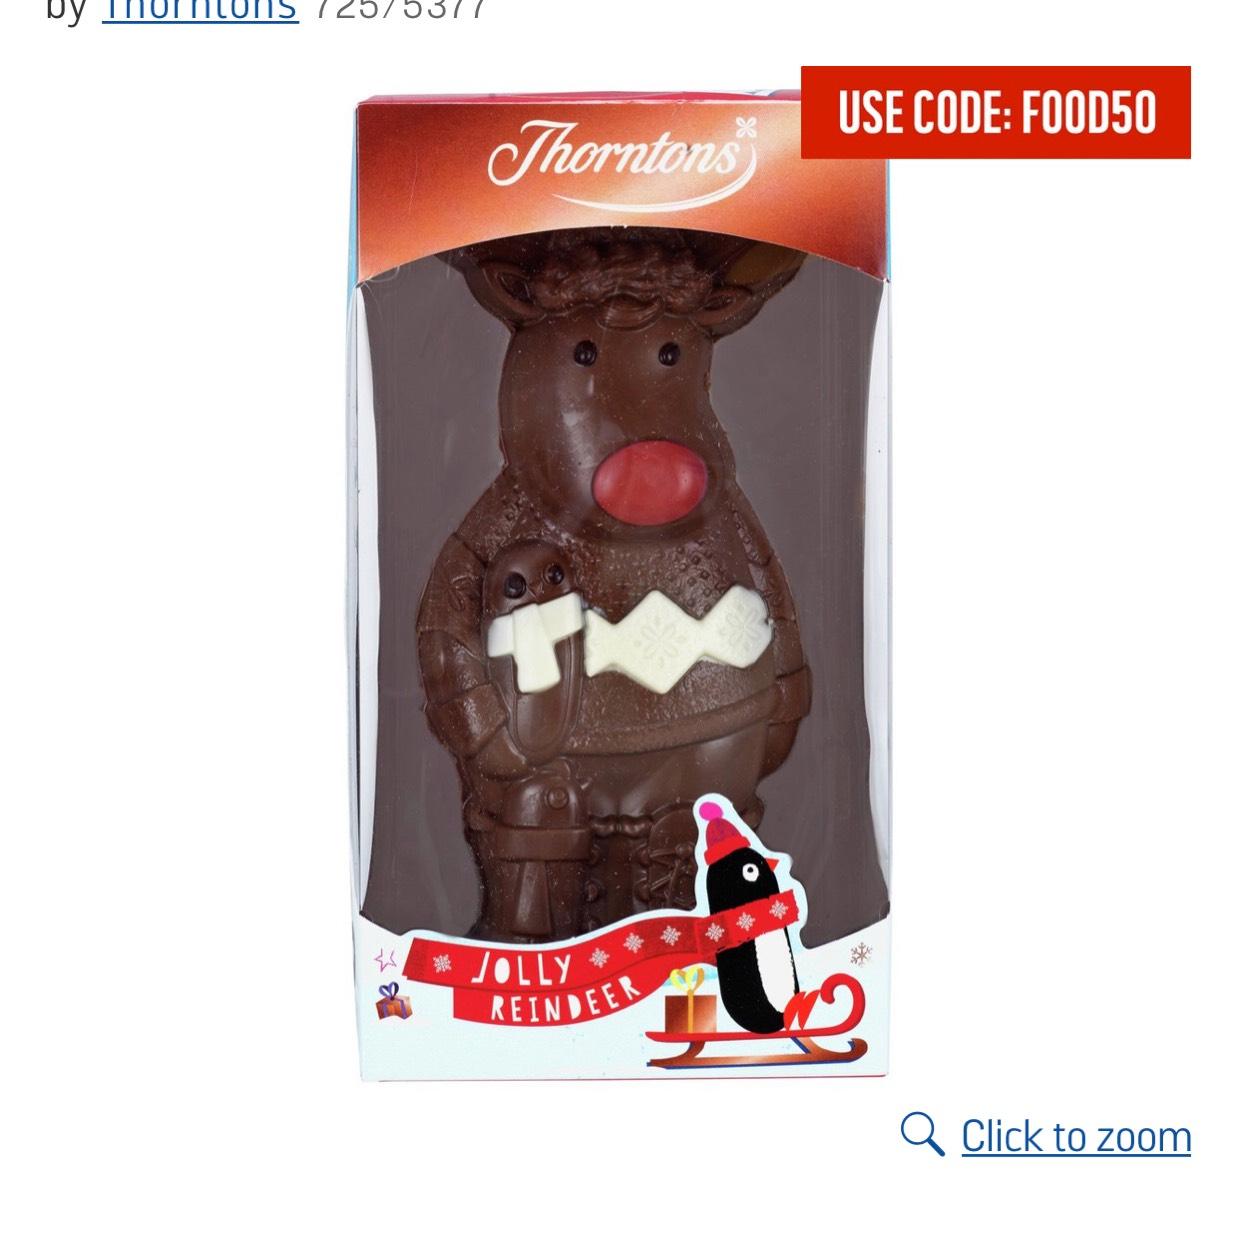 Thorntons Chocolate Reindeer